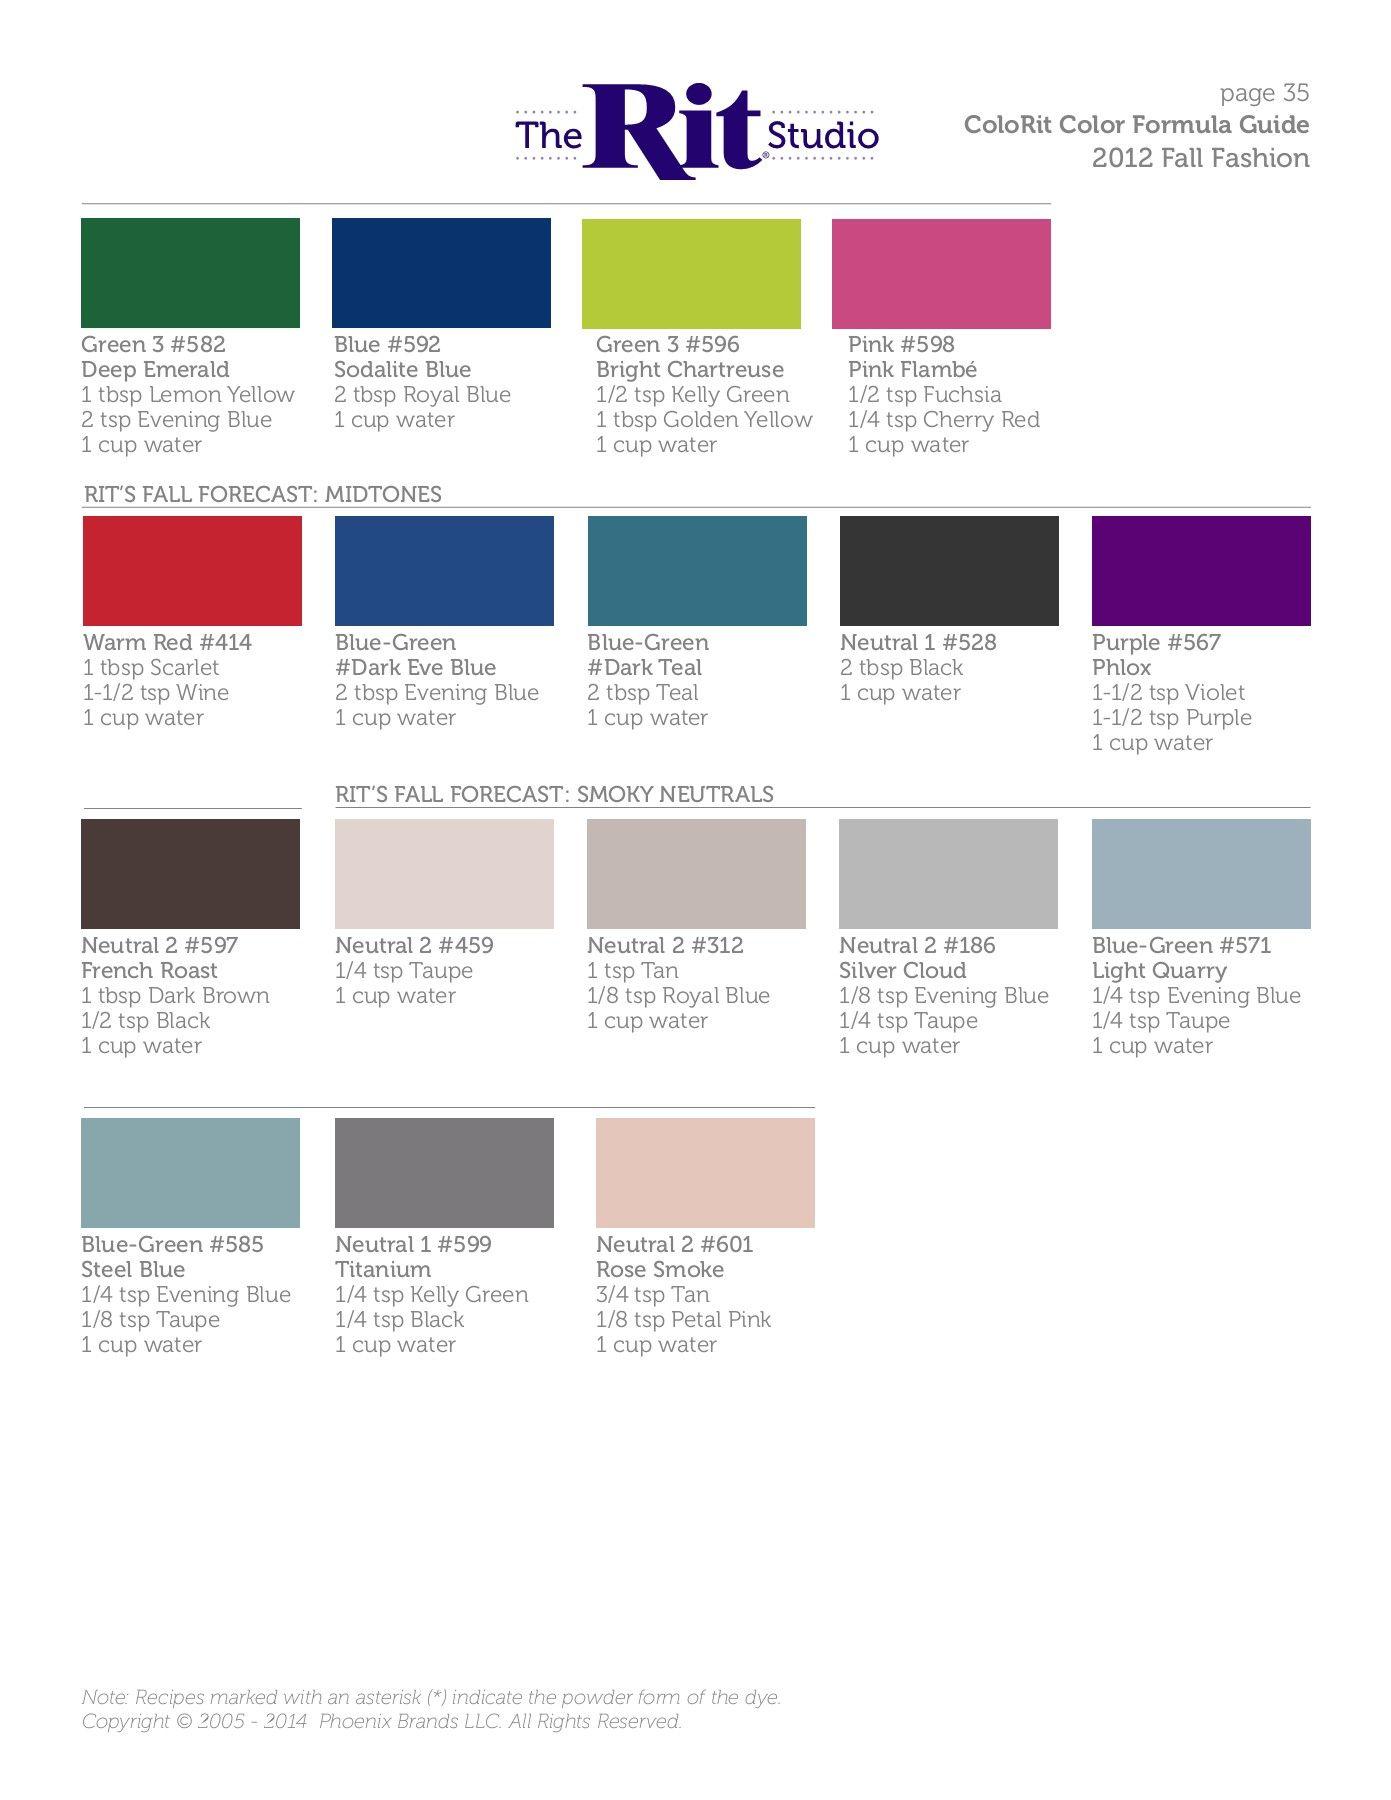 Colorit Color Formula Guide The Rit Studio Rit Dye Colors Chart Tie Dye Diy Tie Dye Patterns Diy